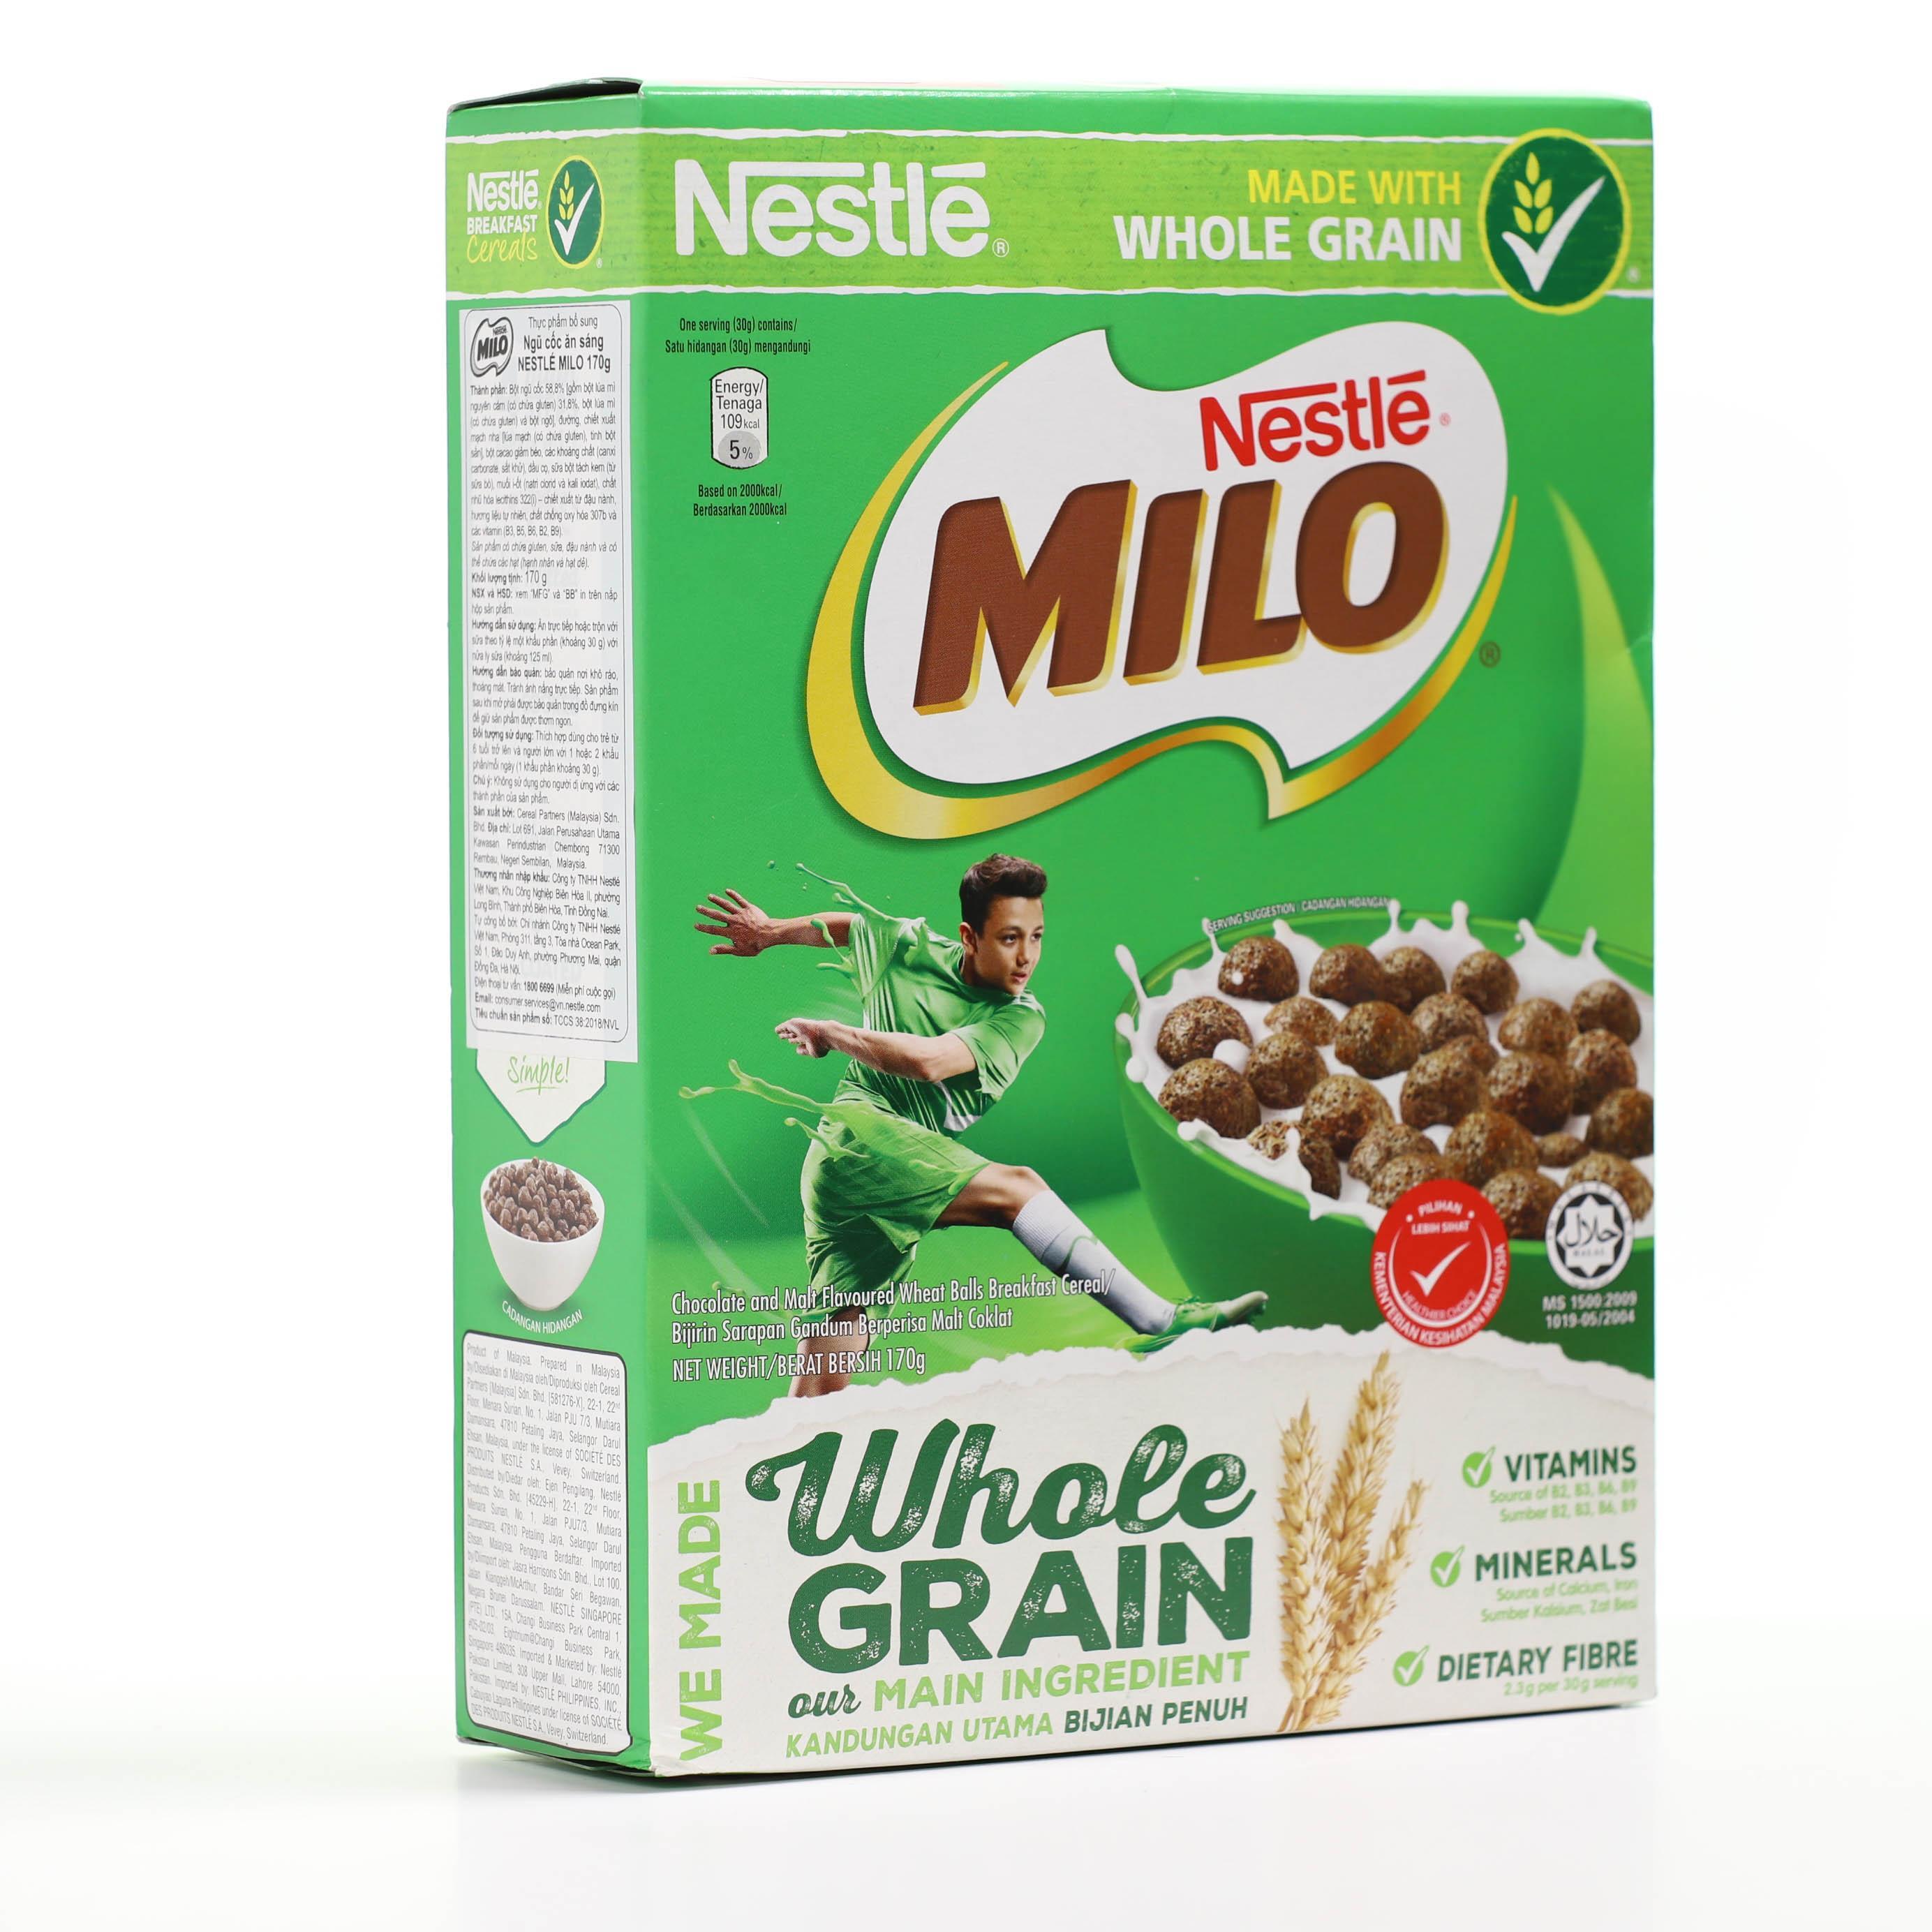 Ngũ cốc ăn sáng Nestle Milo hộp 170g